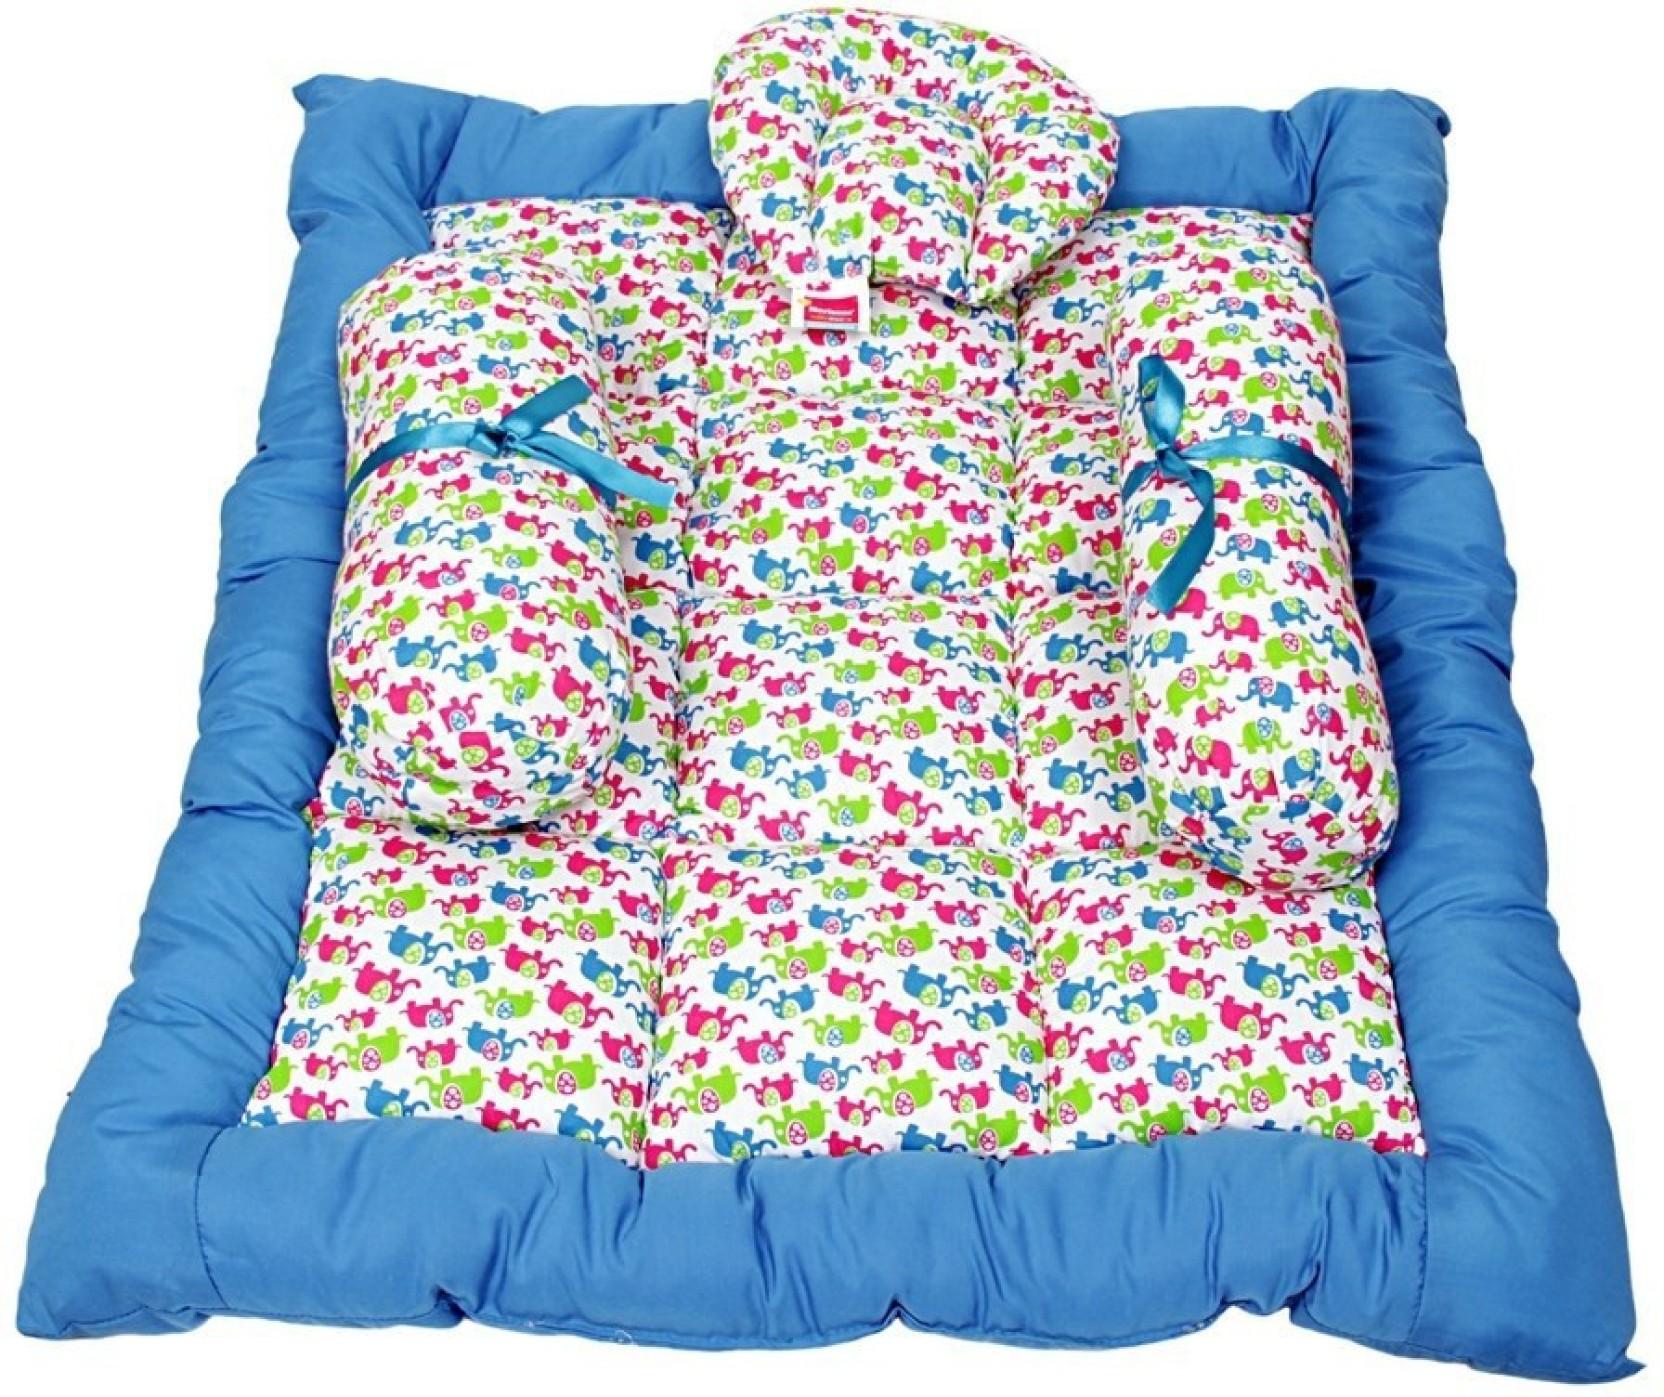 Morisons Baby Dreams Elephant Print Bed Set Carry Mattress Soft Cotton Blue